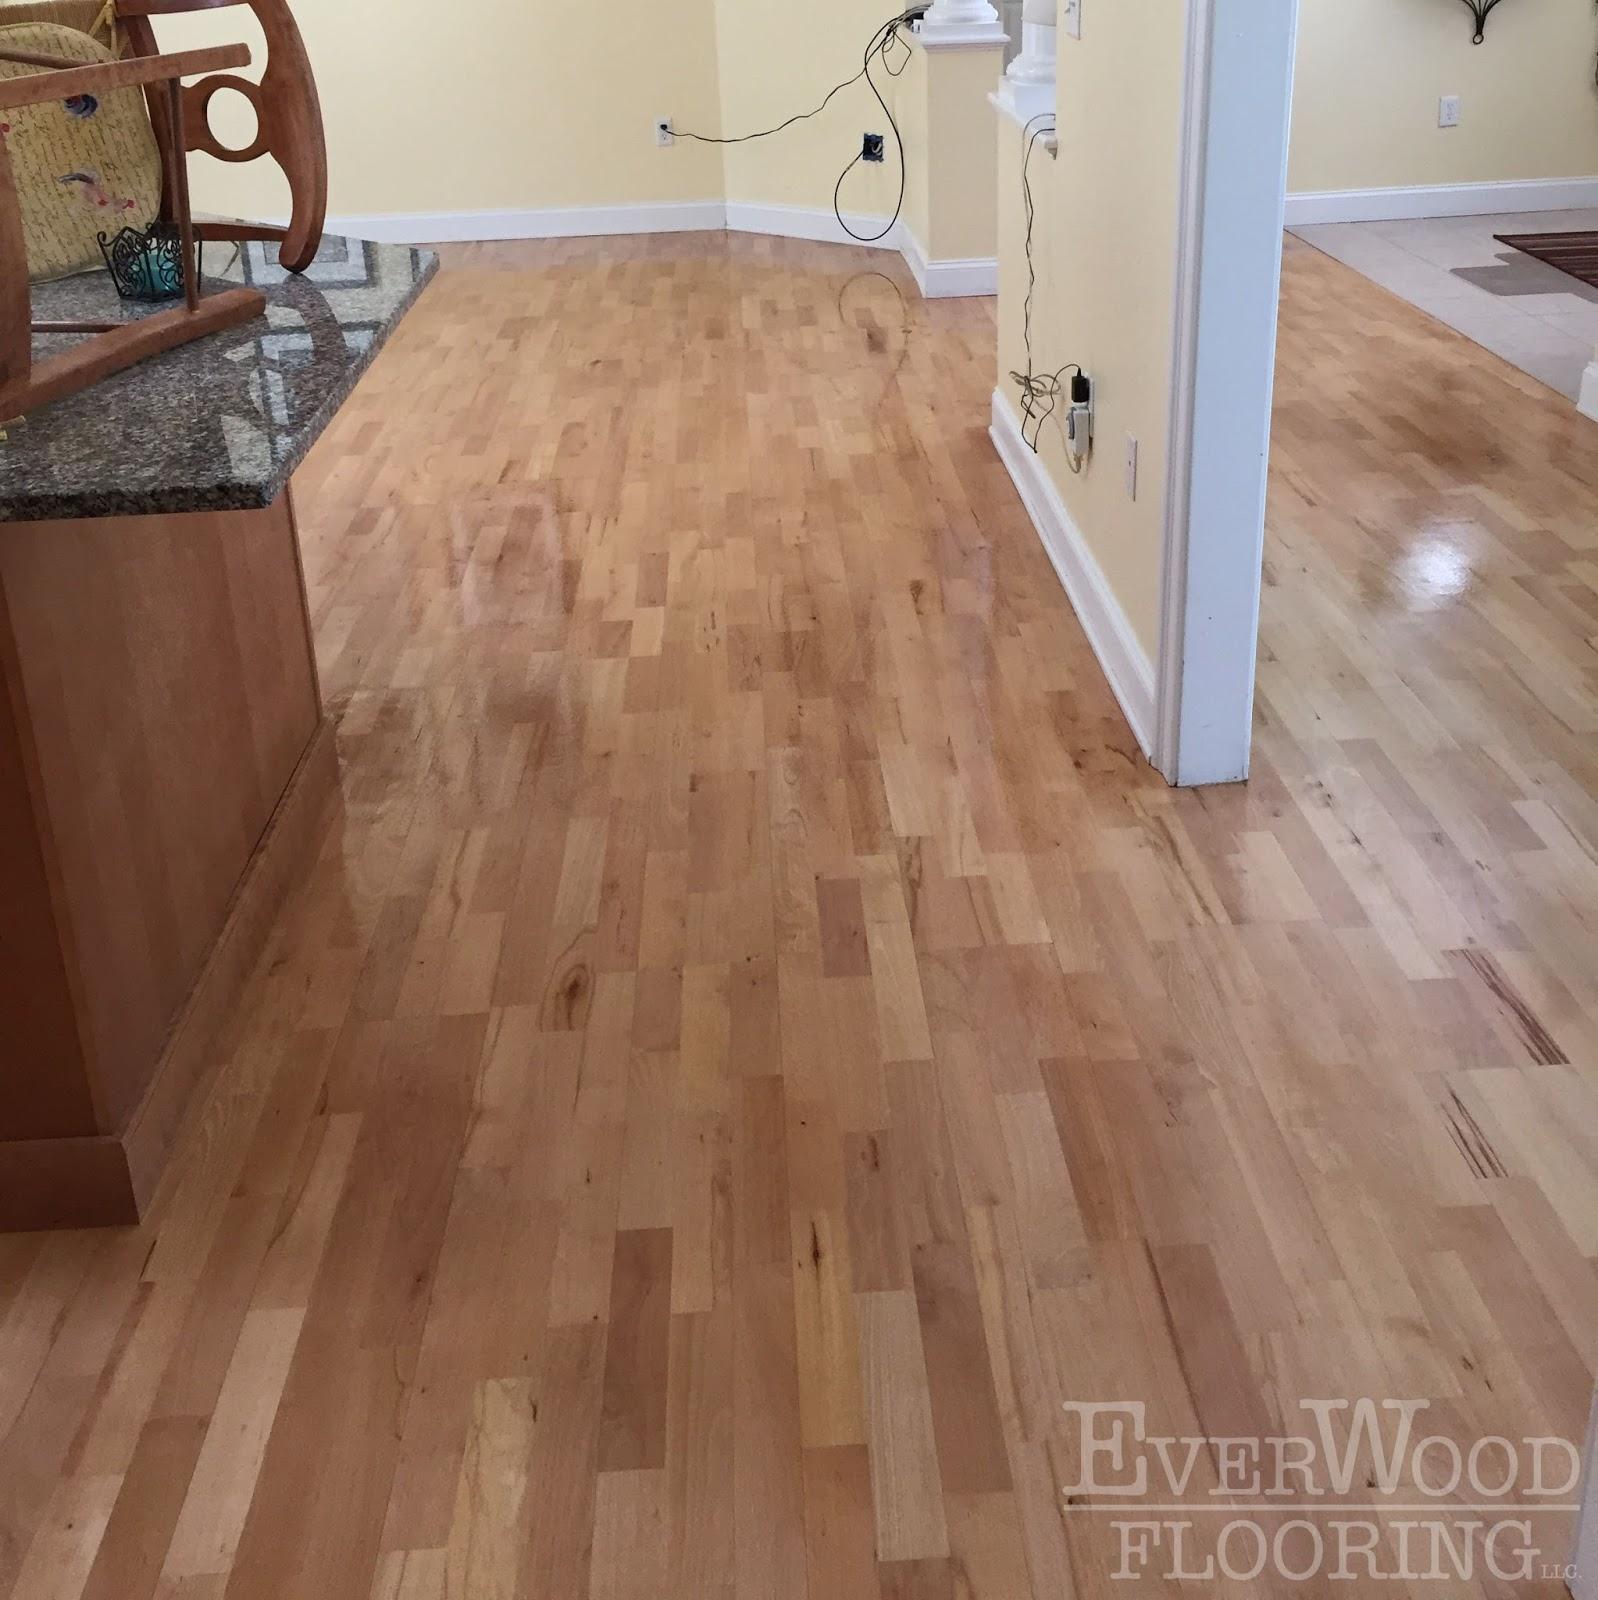 EverWood Flooring Project Profiles: Engineered Floor